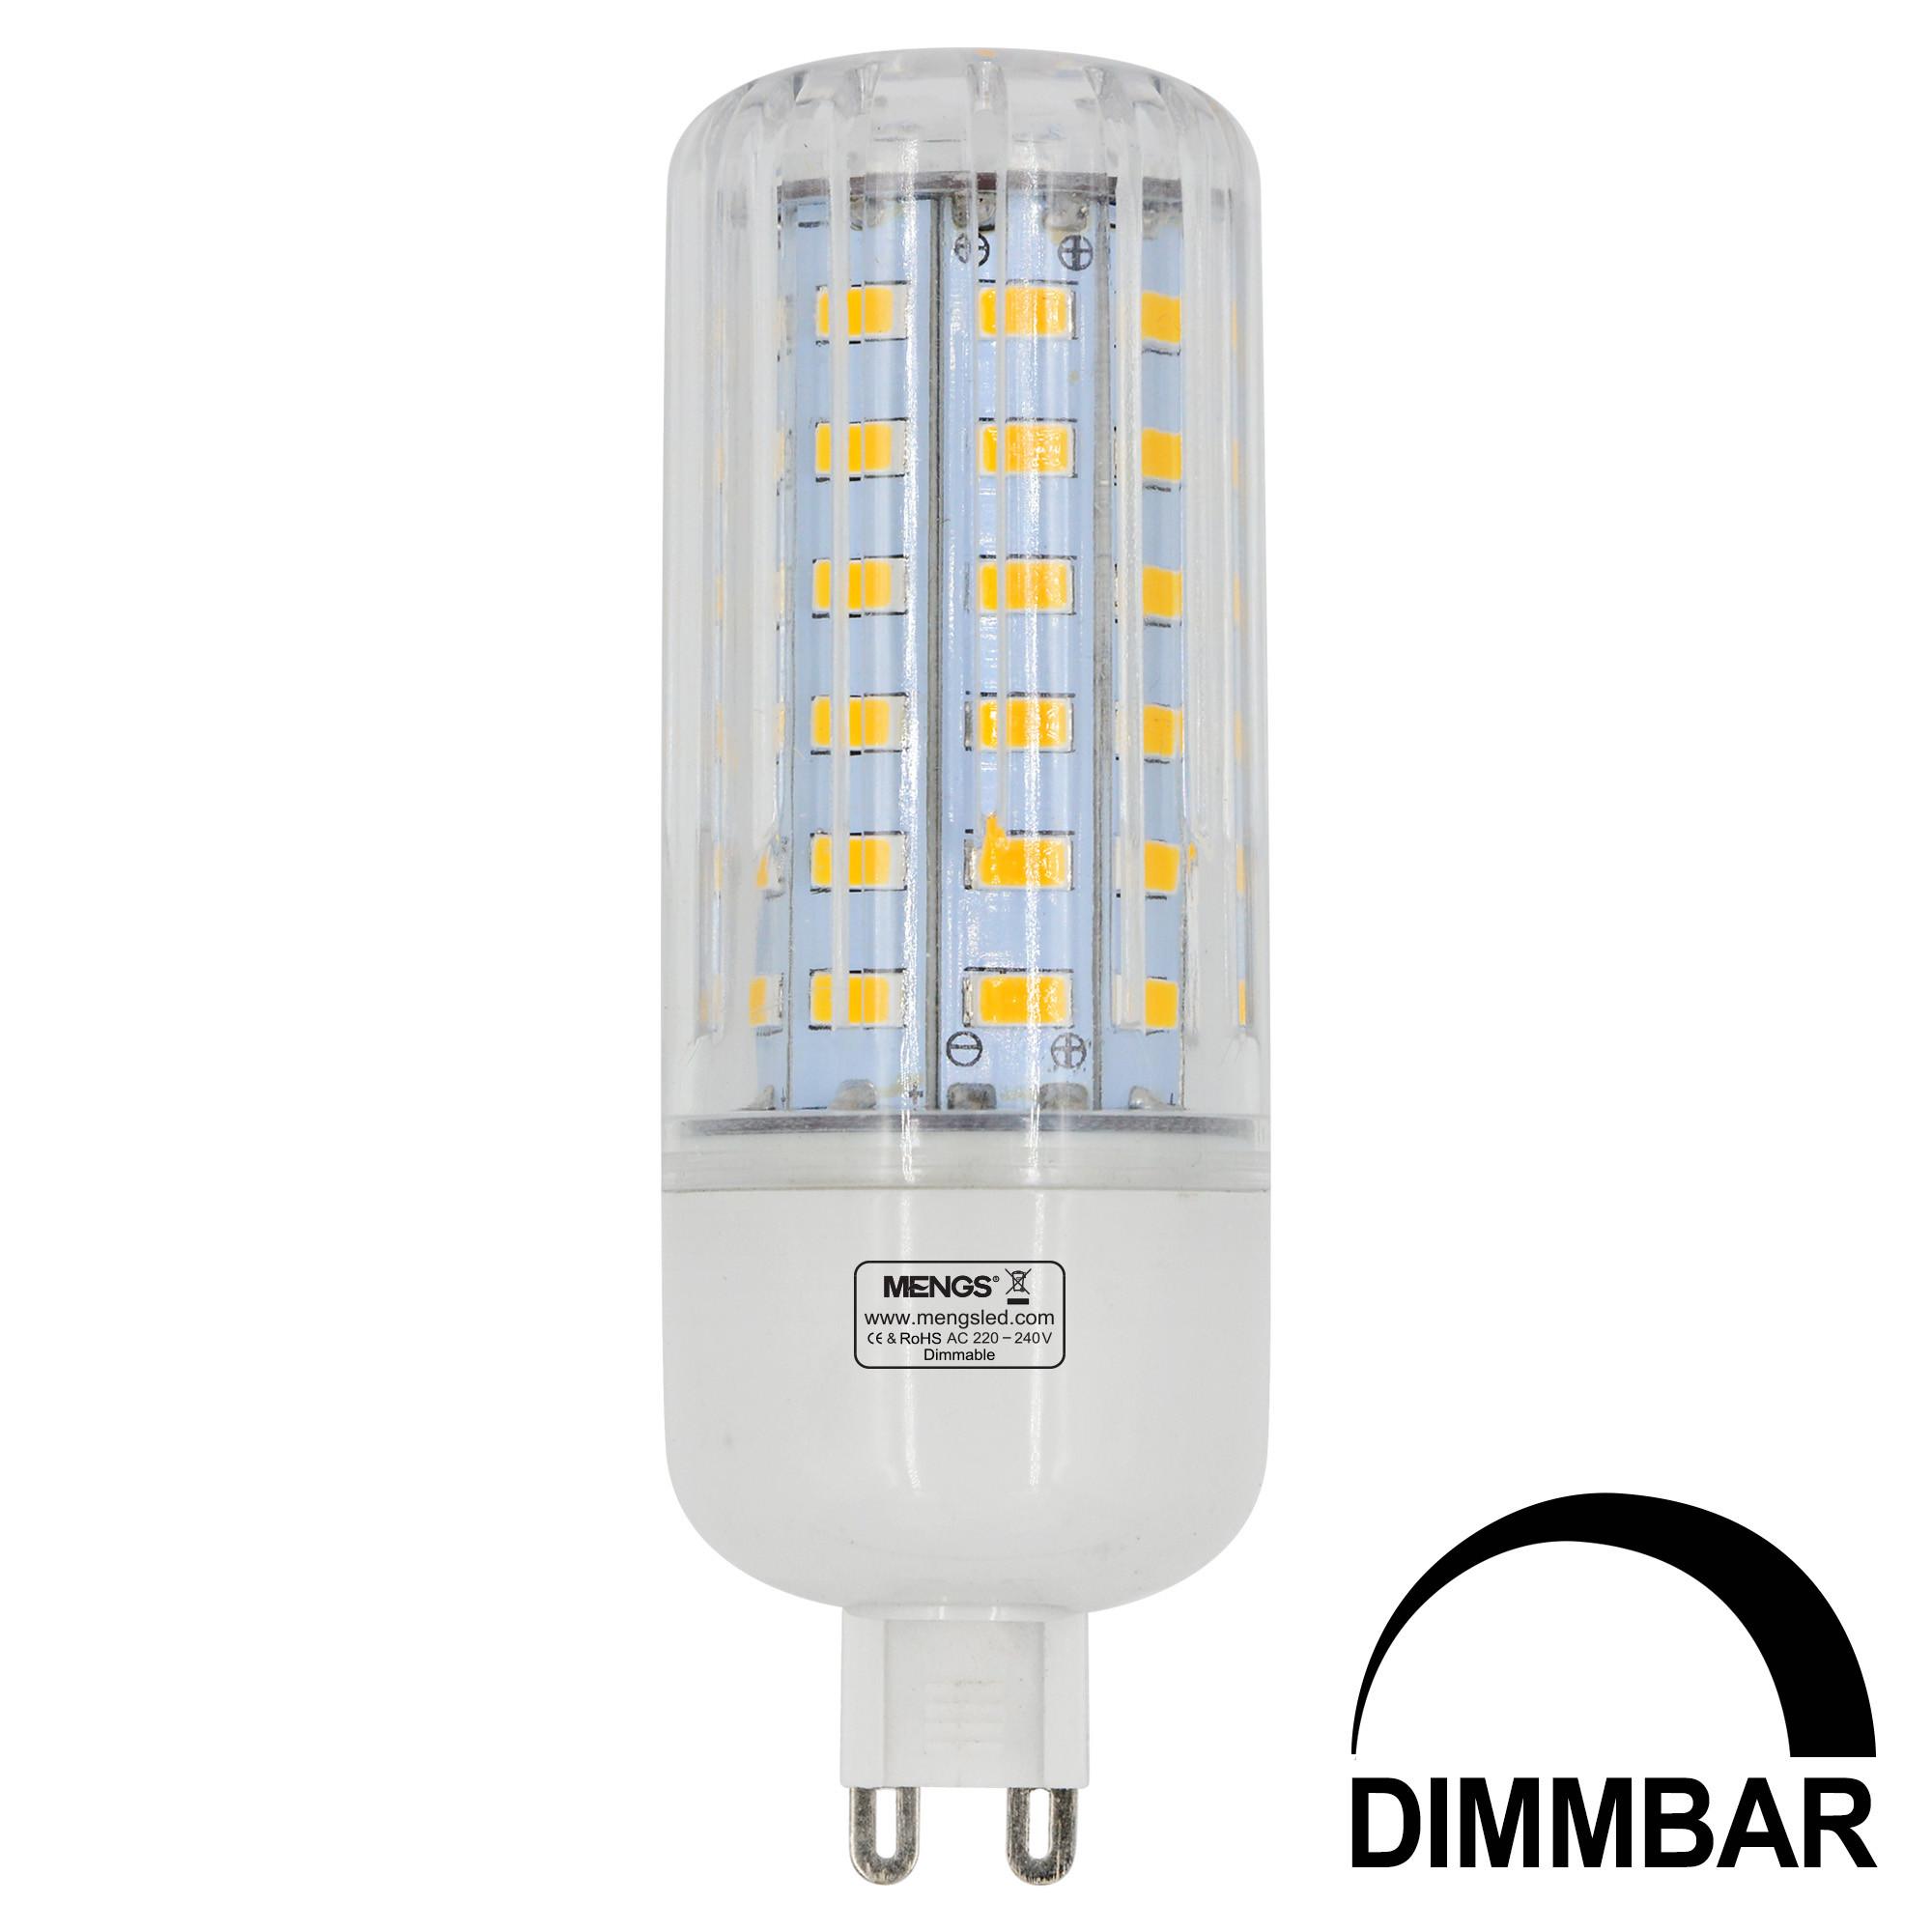 MENGS® G9 9W LED Dimmable Corn Light 60x 5736 SMD LED Bulb Lamp AC 220-240V In Warm White Energy-Saving Light